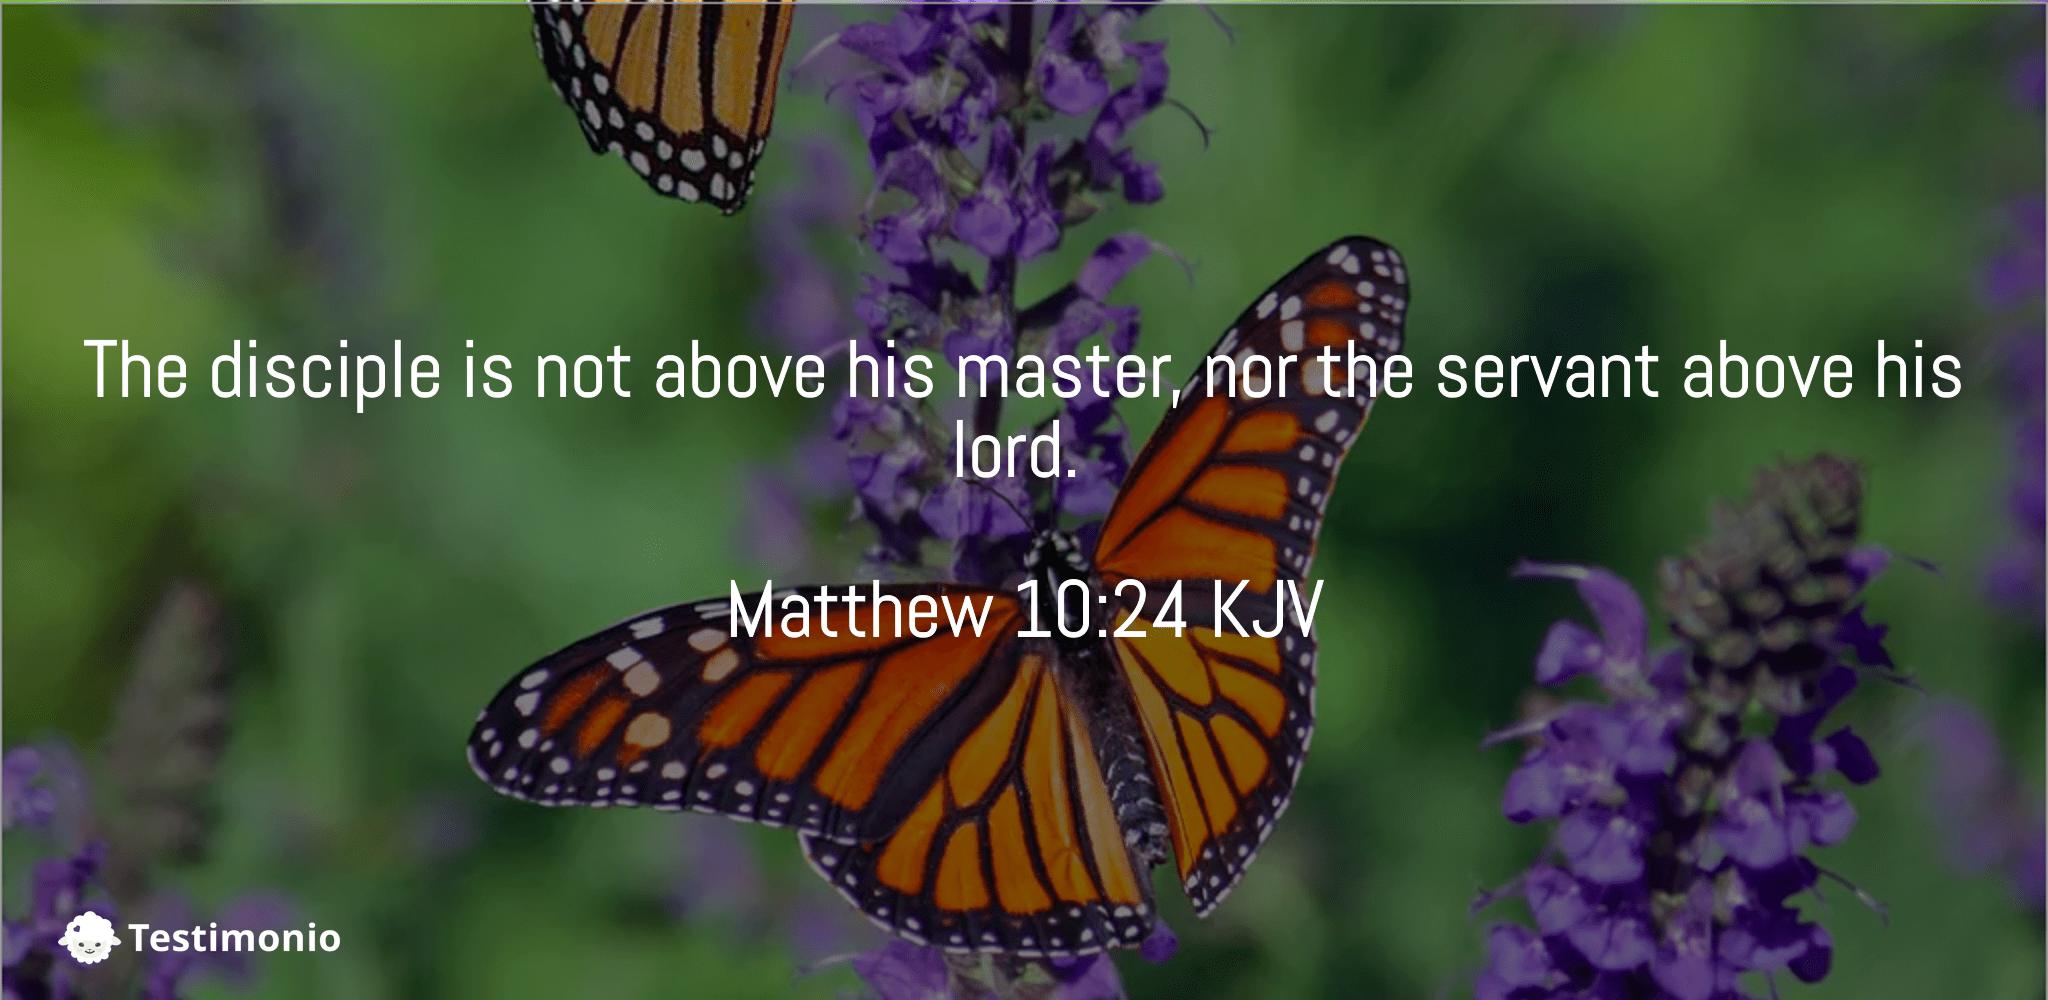 Matthew 10:24